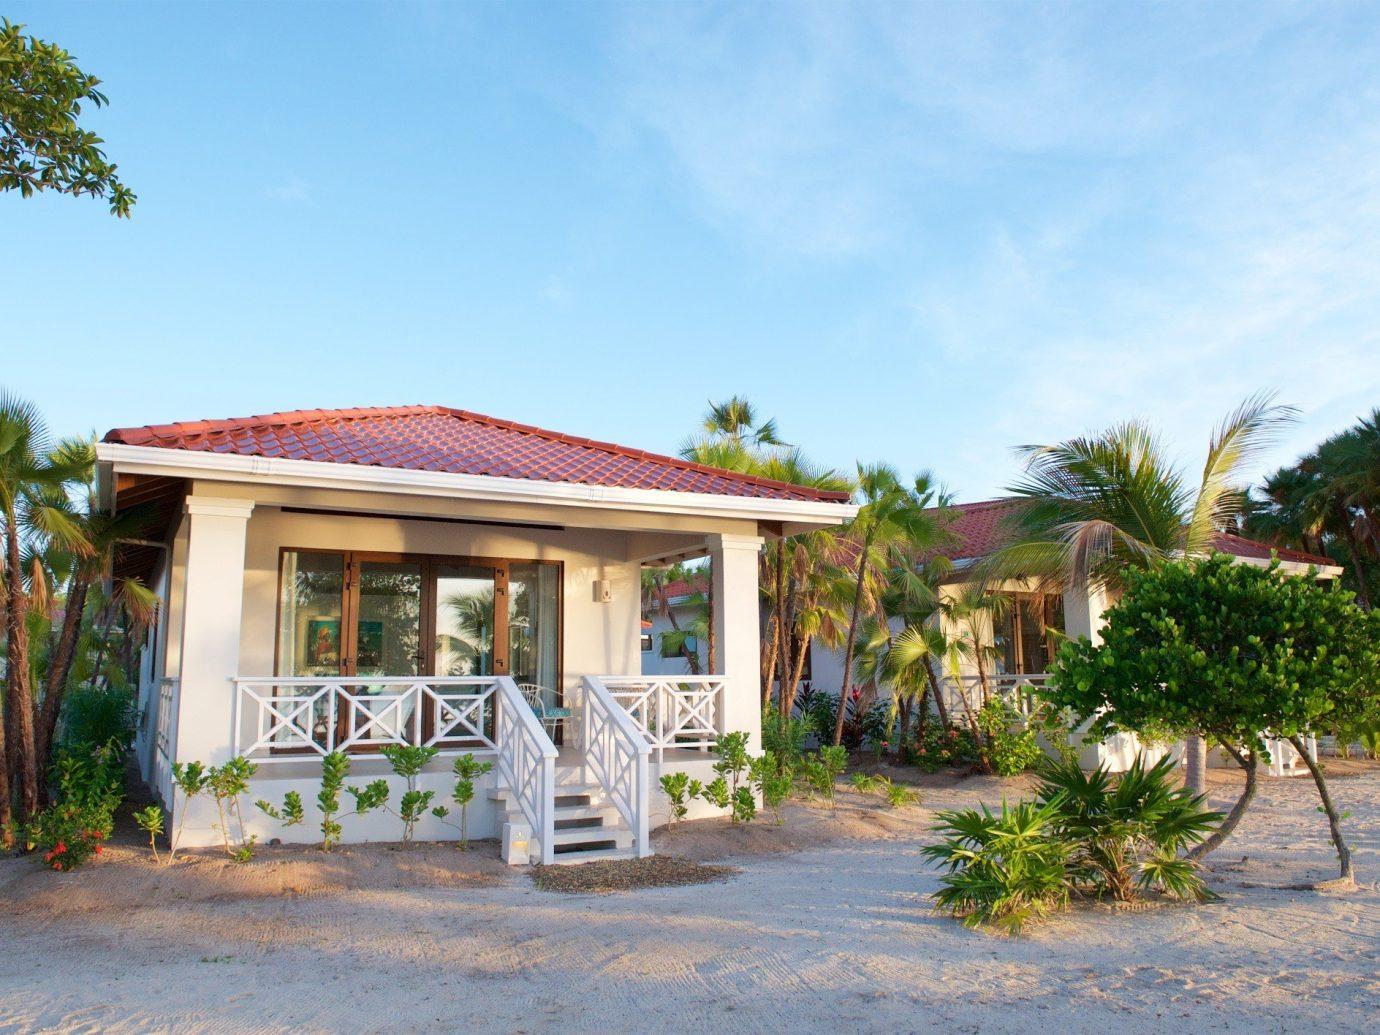 Belize Yoga Retreat In The Caribbean